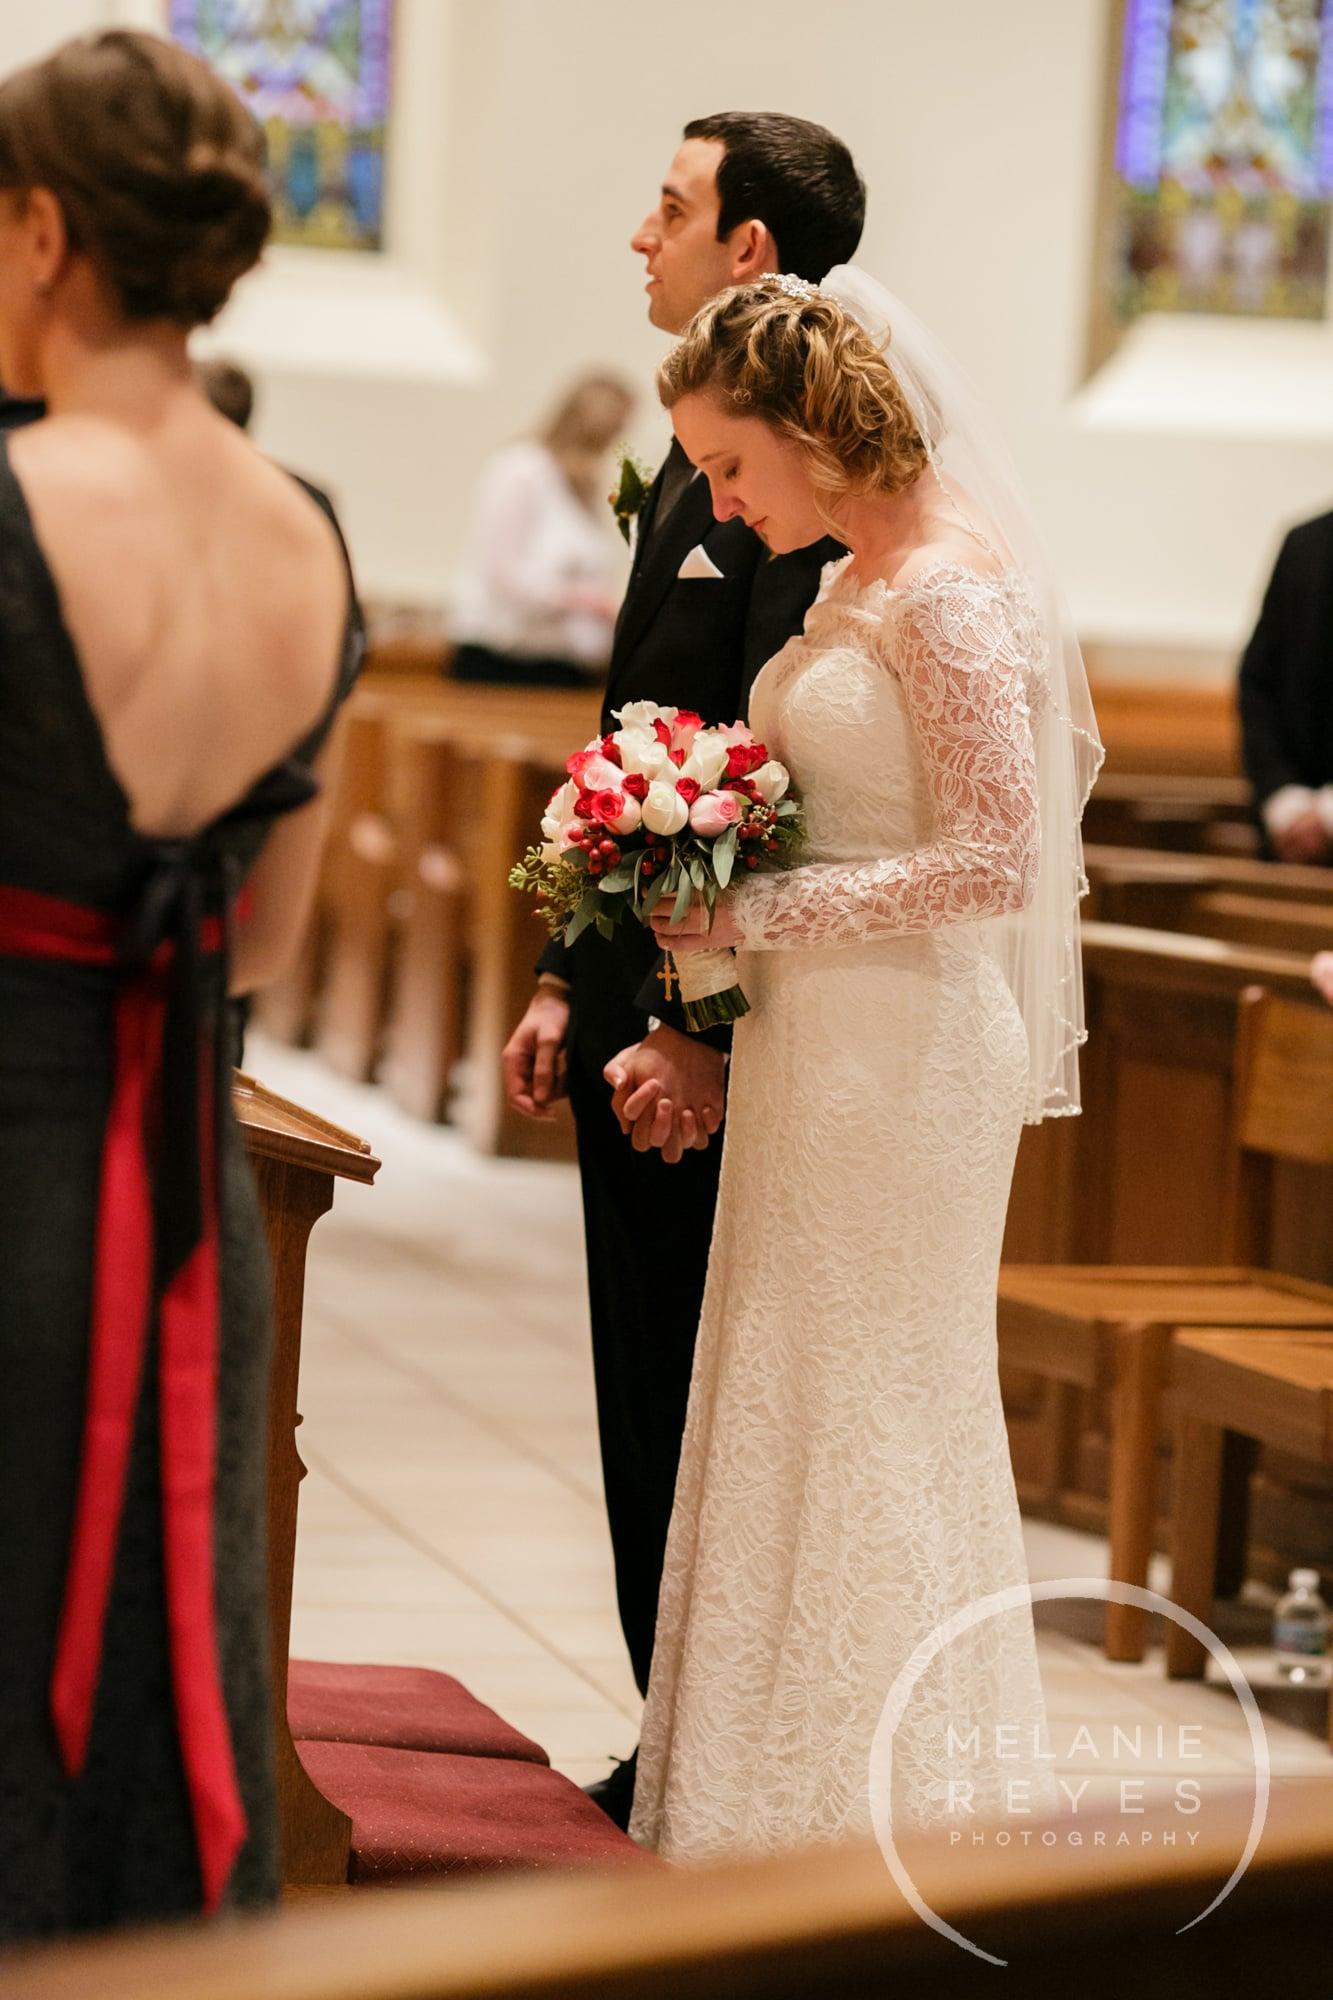 2015_ann_arbor_wedding_photographer_melaniereyes_026.JPG